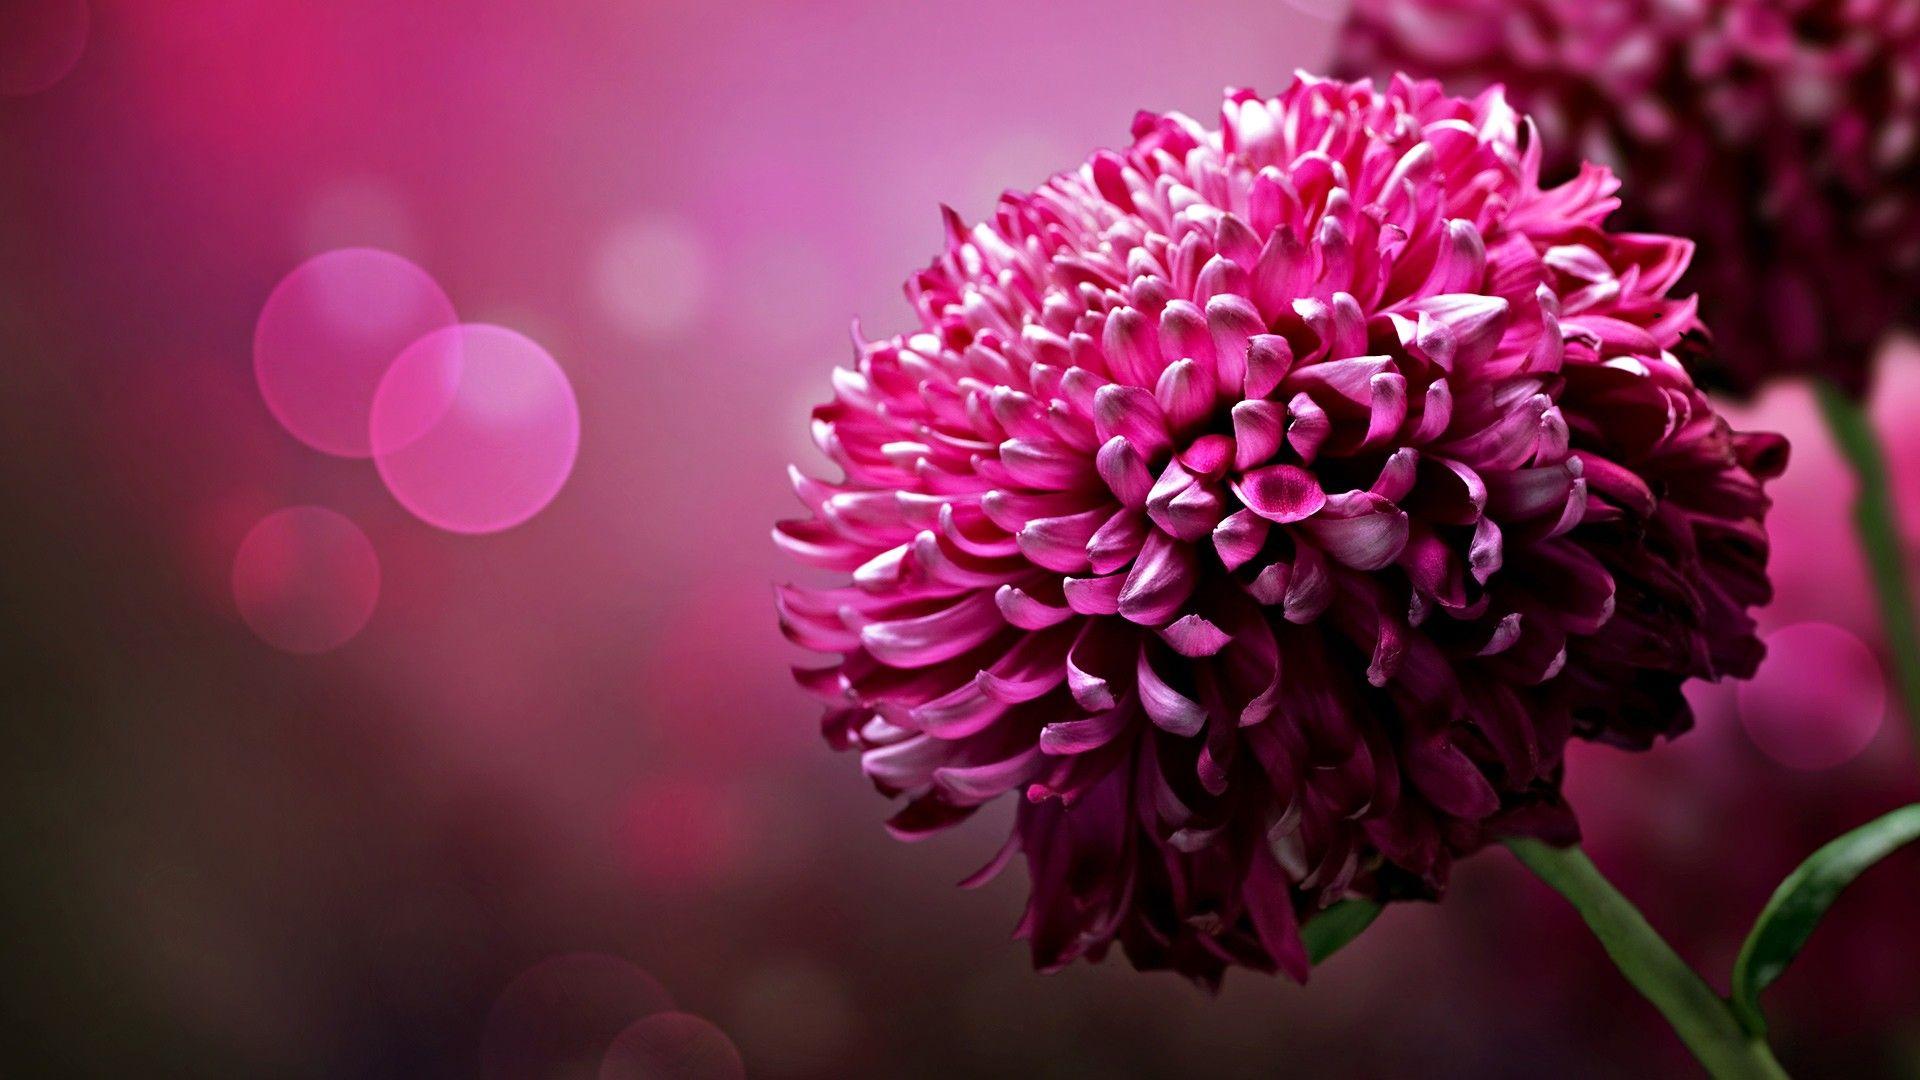 Wonderful Nature Flower Wallpaper 1920x1080